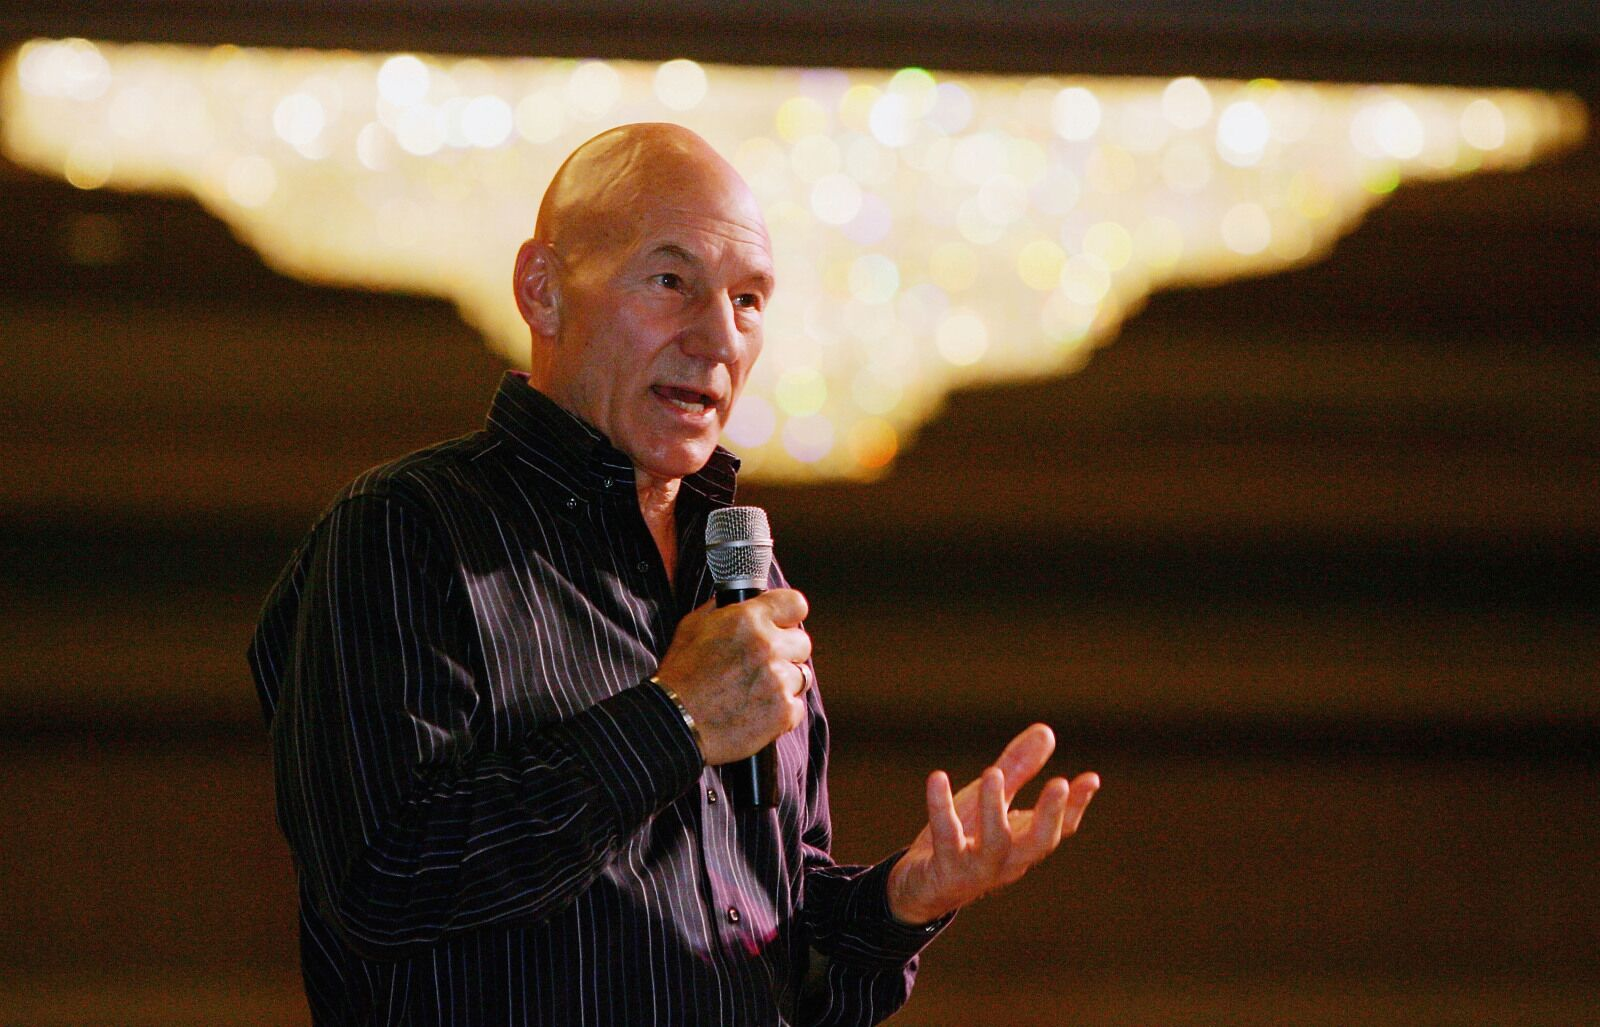 Picard-based Star Trek series adds Evan Evagora to cast